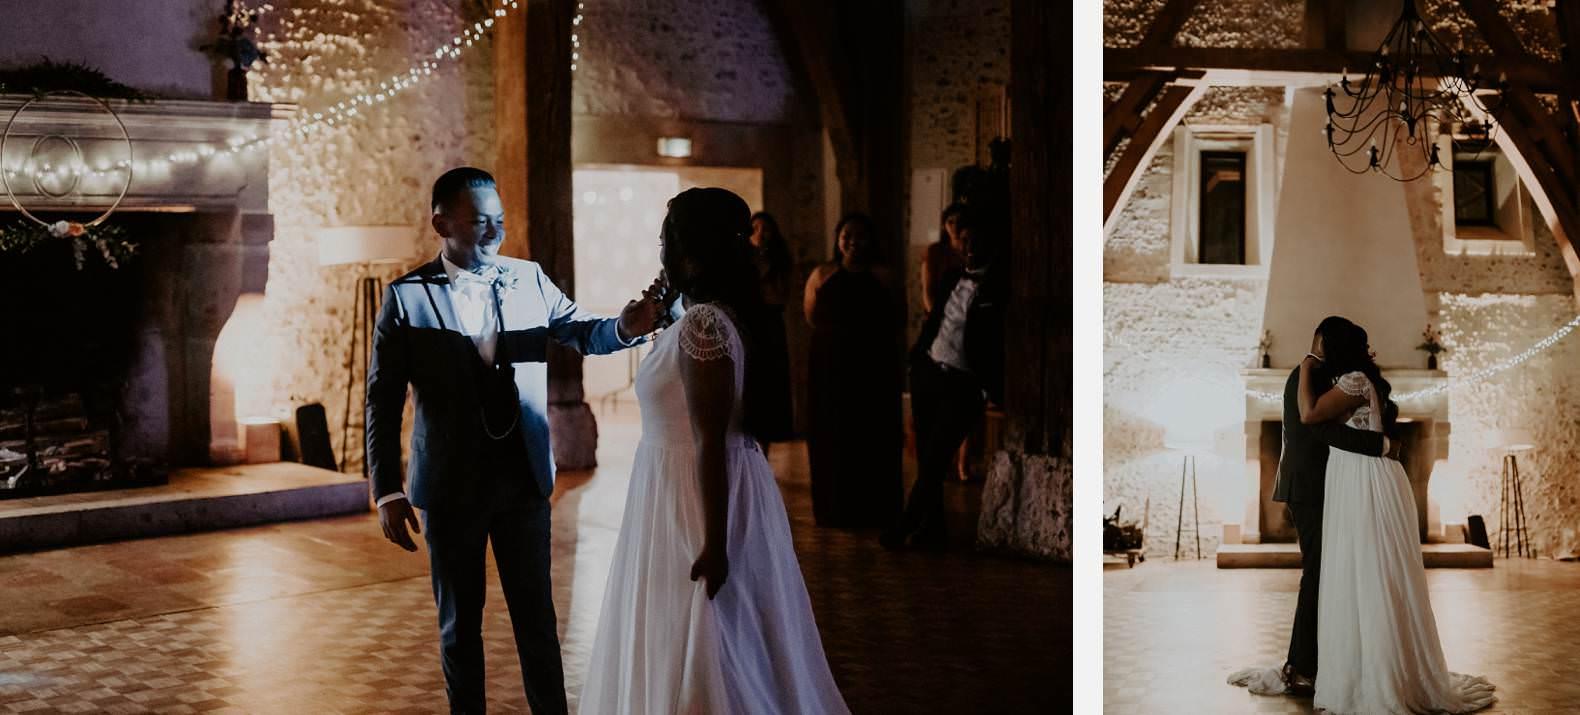 mariage manoir de corny photographe bel esprit 0068 1